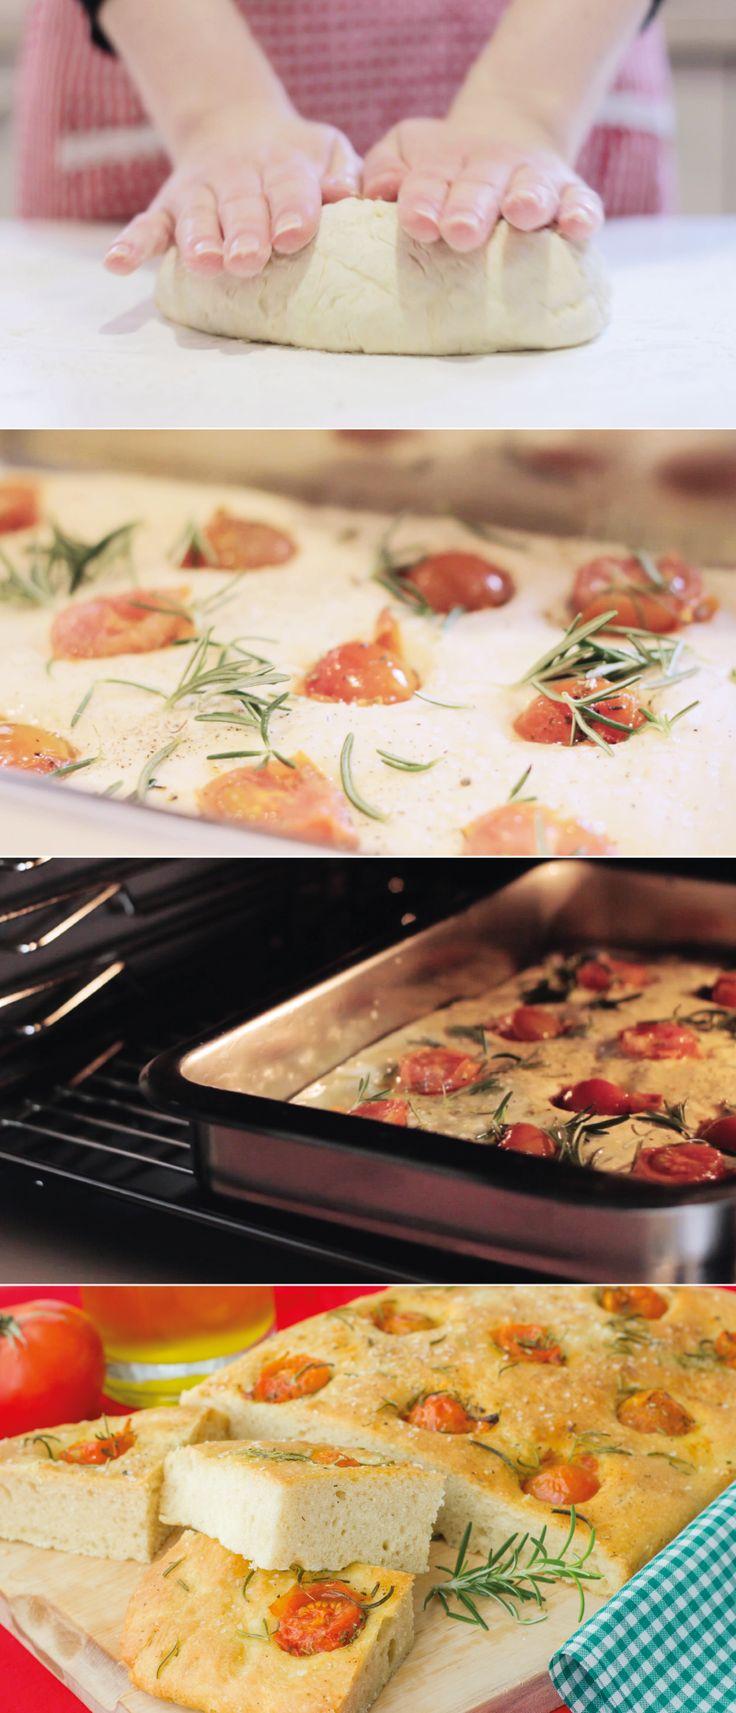 #receta Focaccia con Tomates Cherry y Romero – Pan Italiano